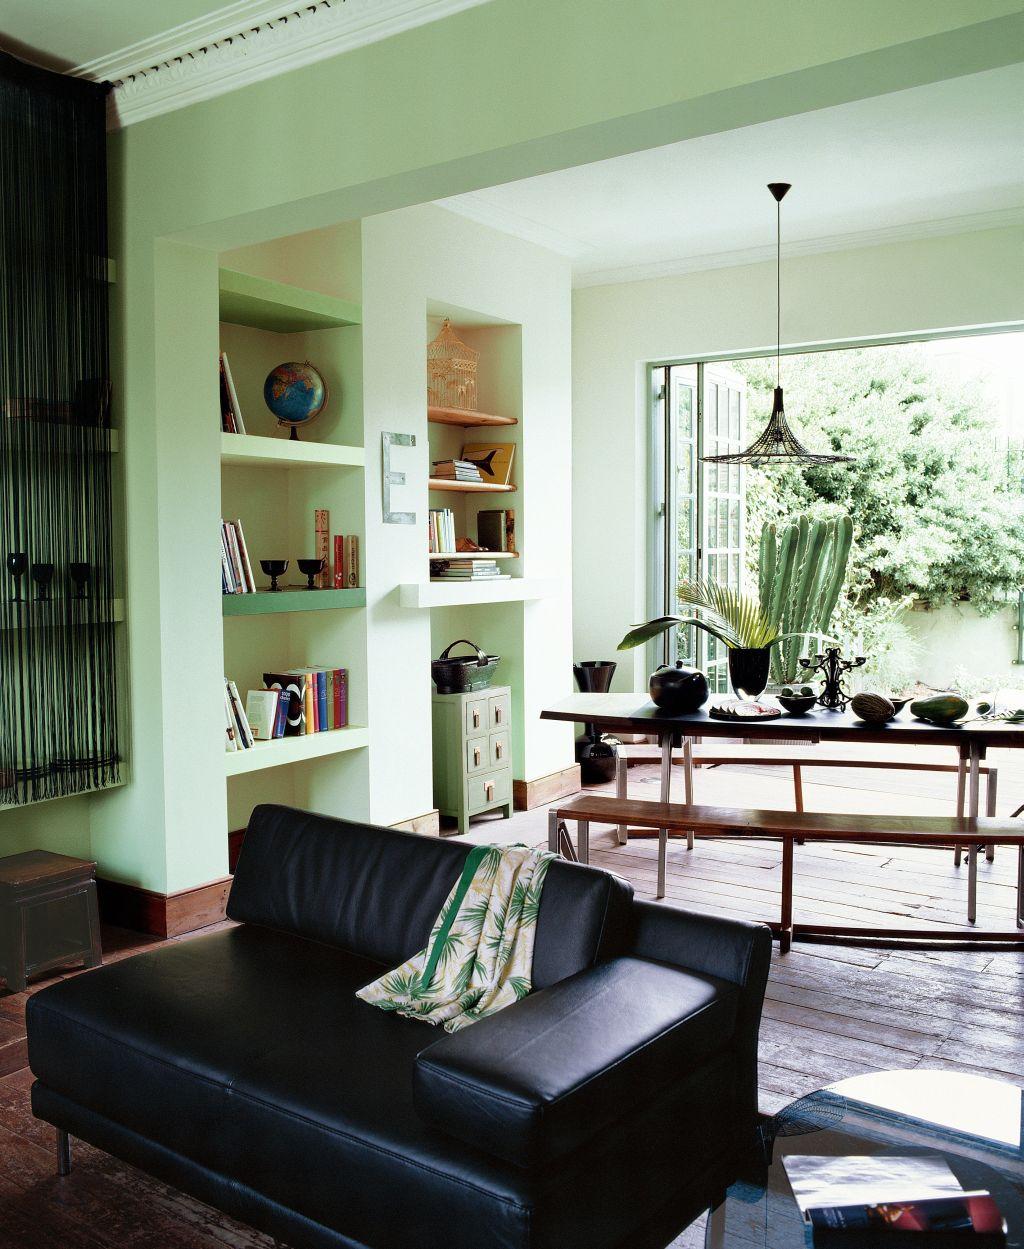 Nuanta de verde potrivita in interior cu pardoseala si mobila inchise Foto Copyright © Akzo Nobel